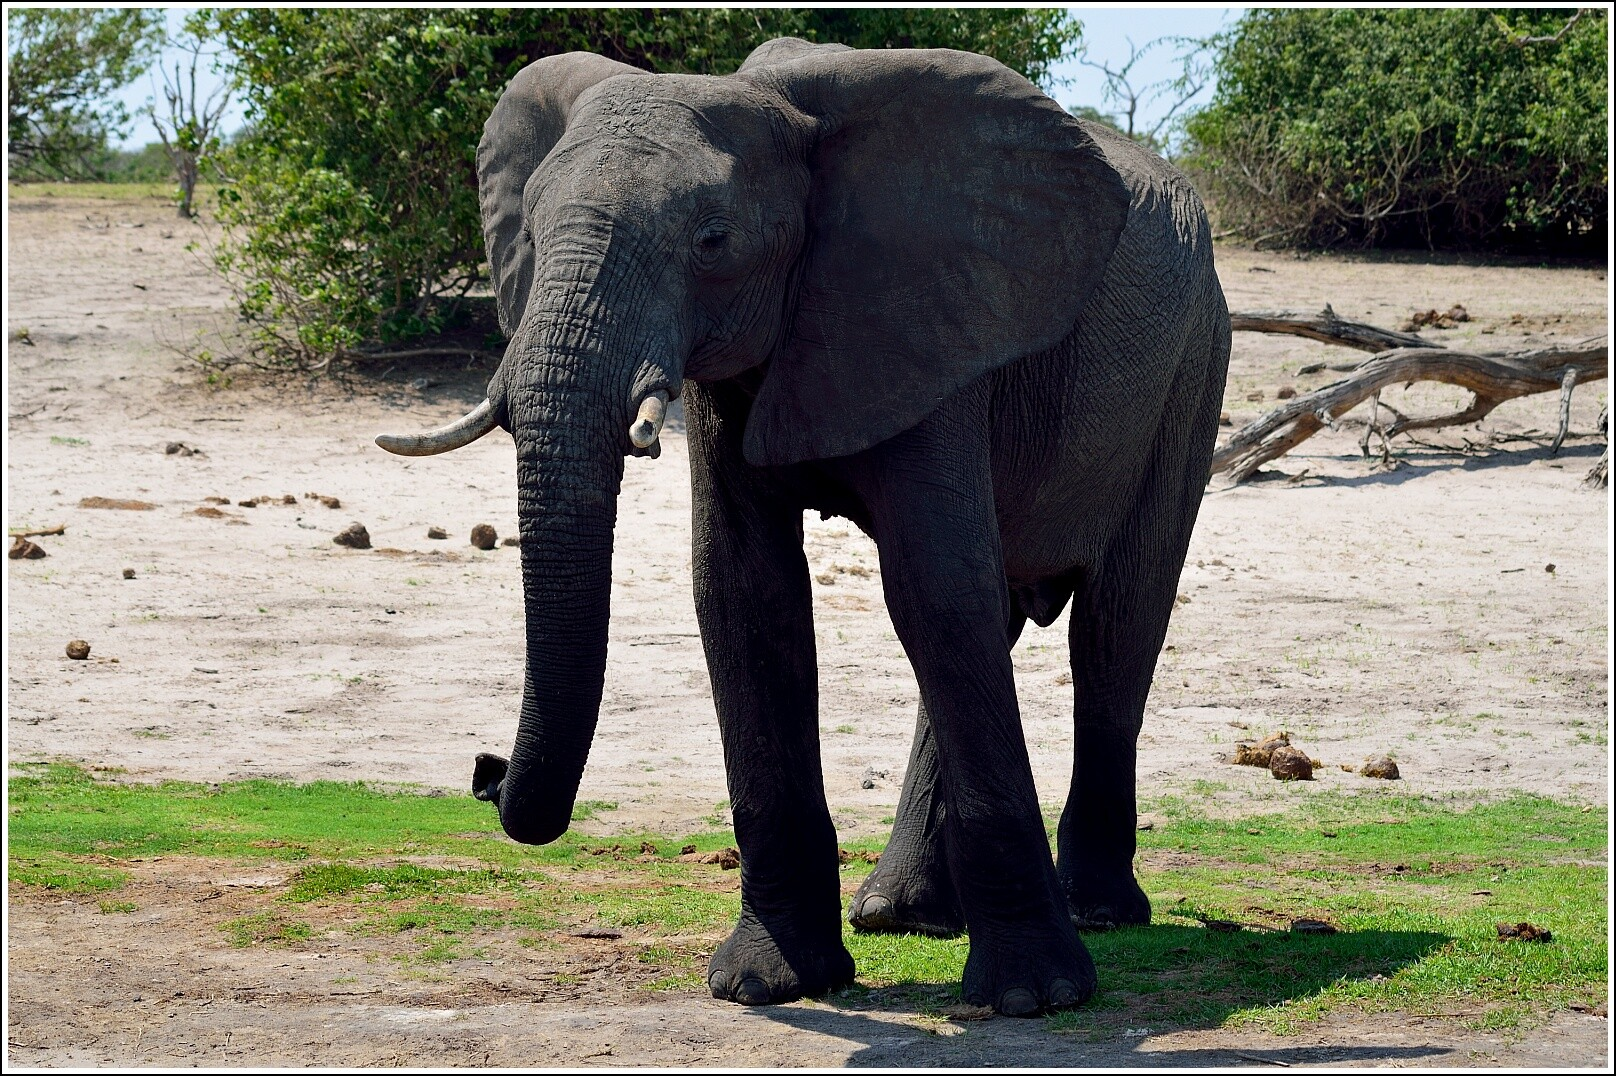 этот картинки жирафа слона зебры клаус популярный